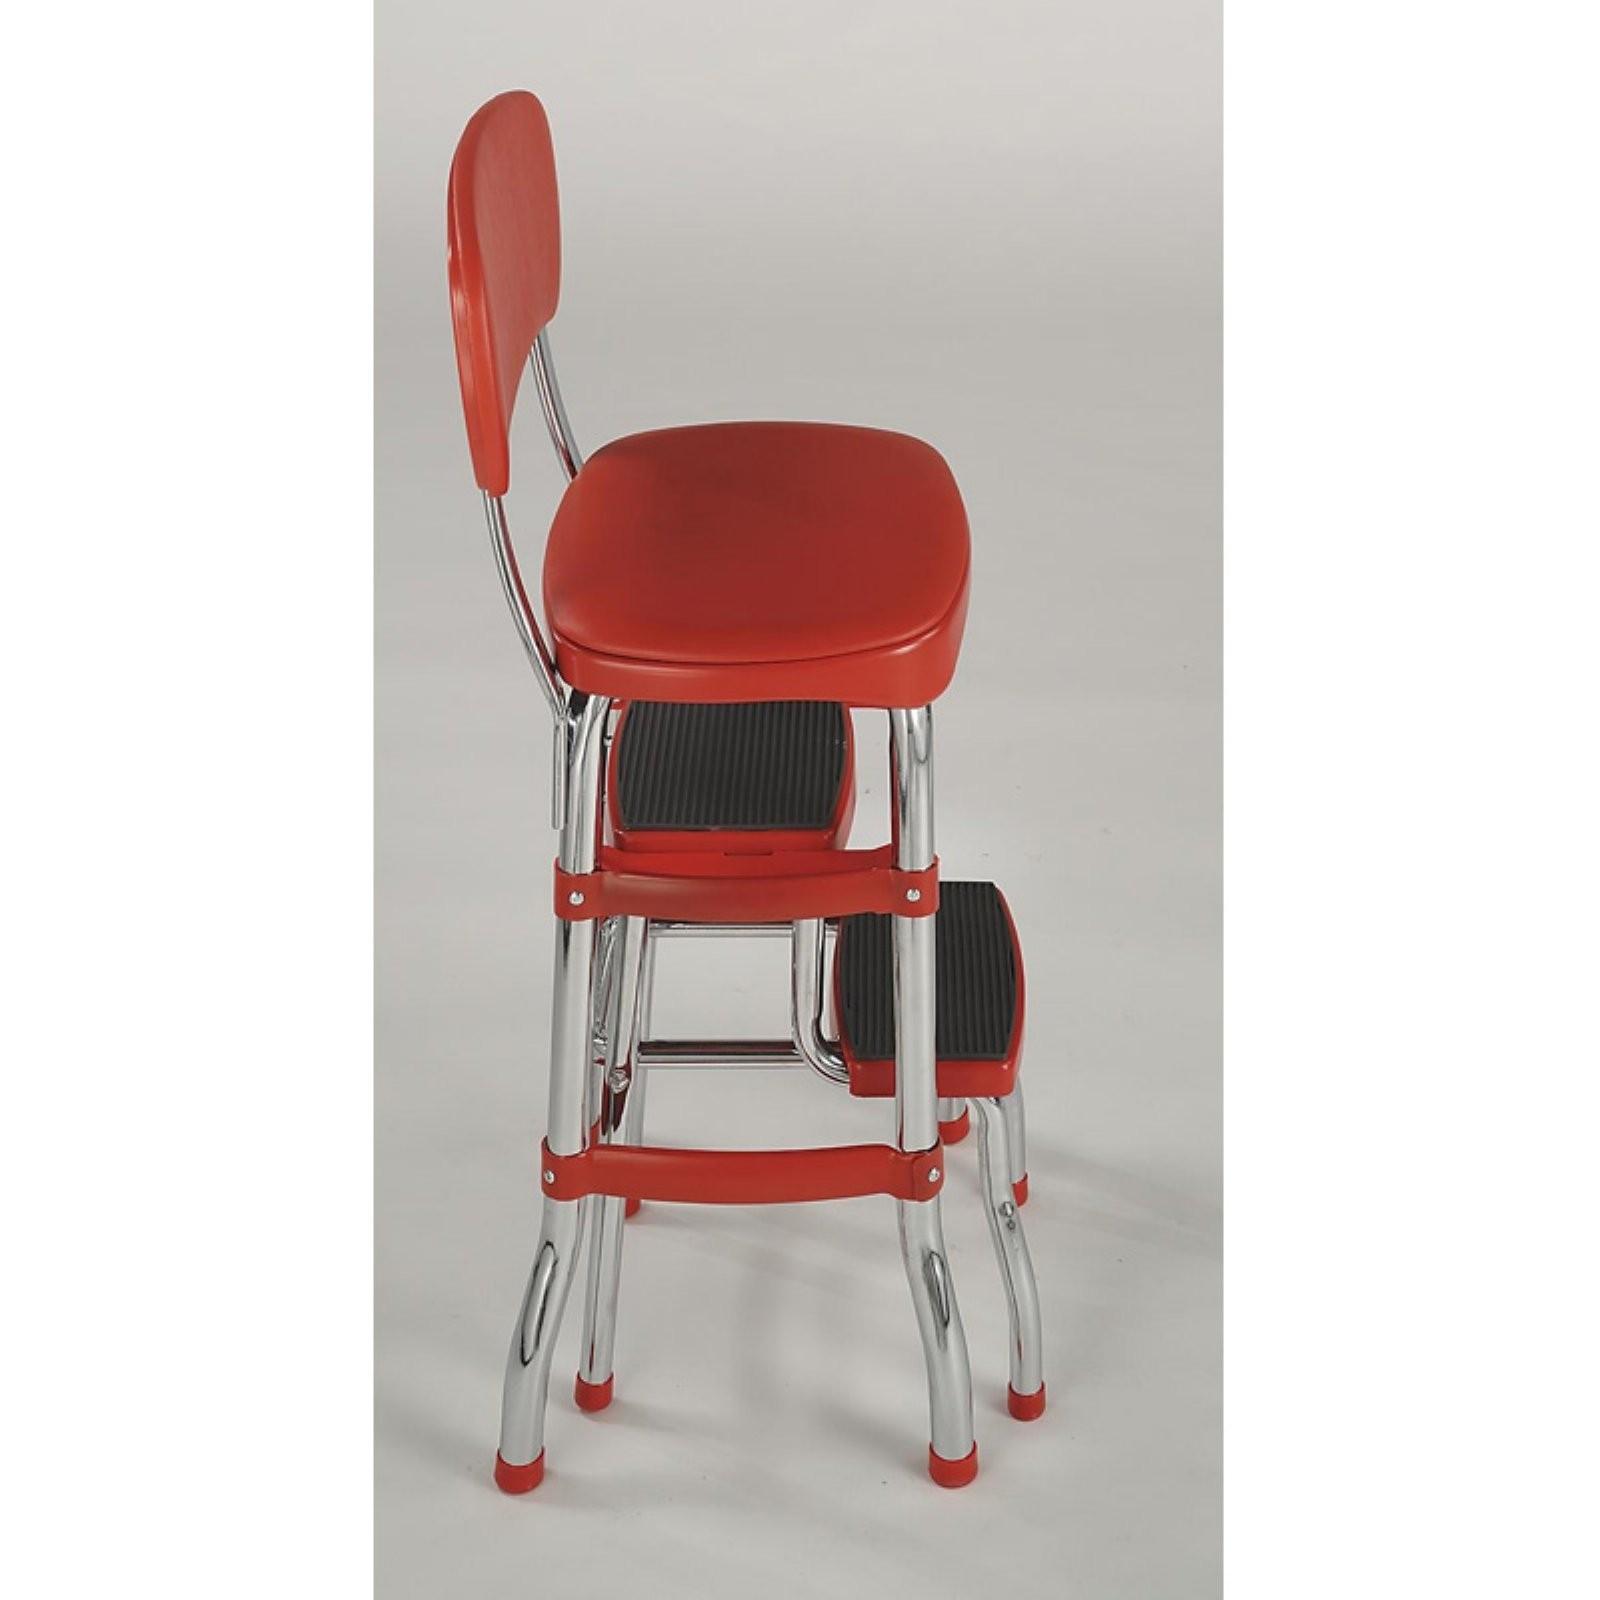 Charmant Cosco Retro Counter Chair / Step Stool